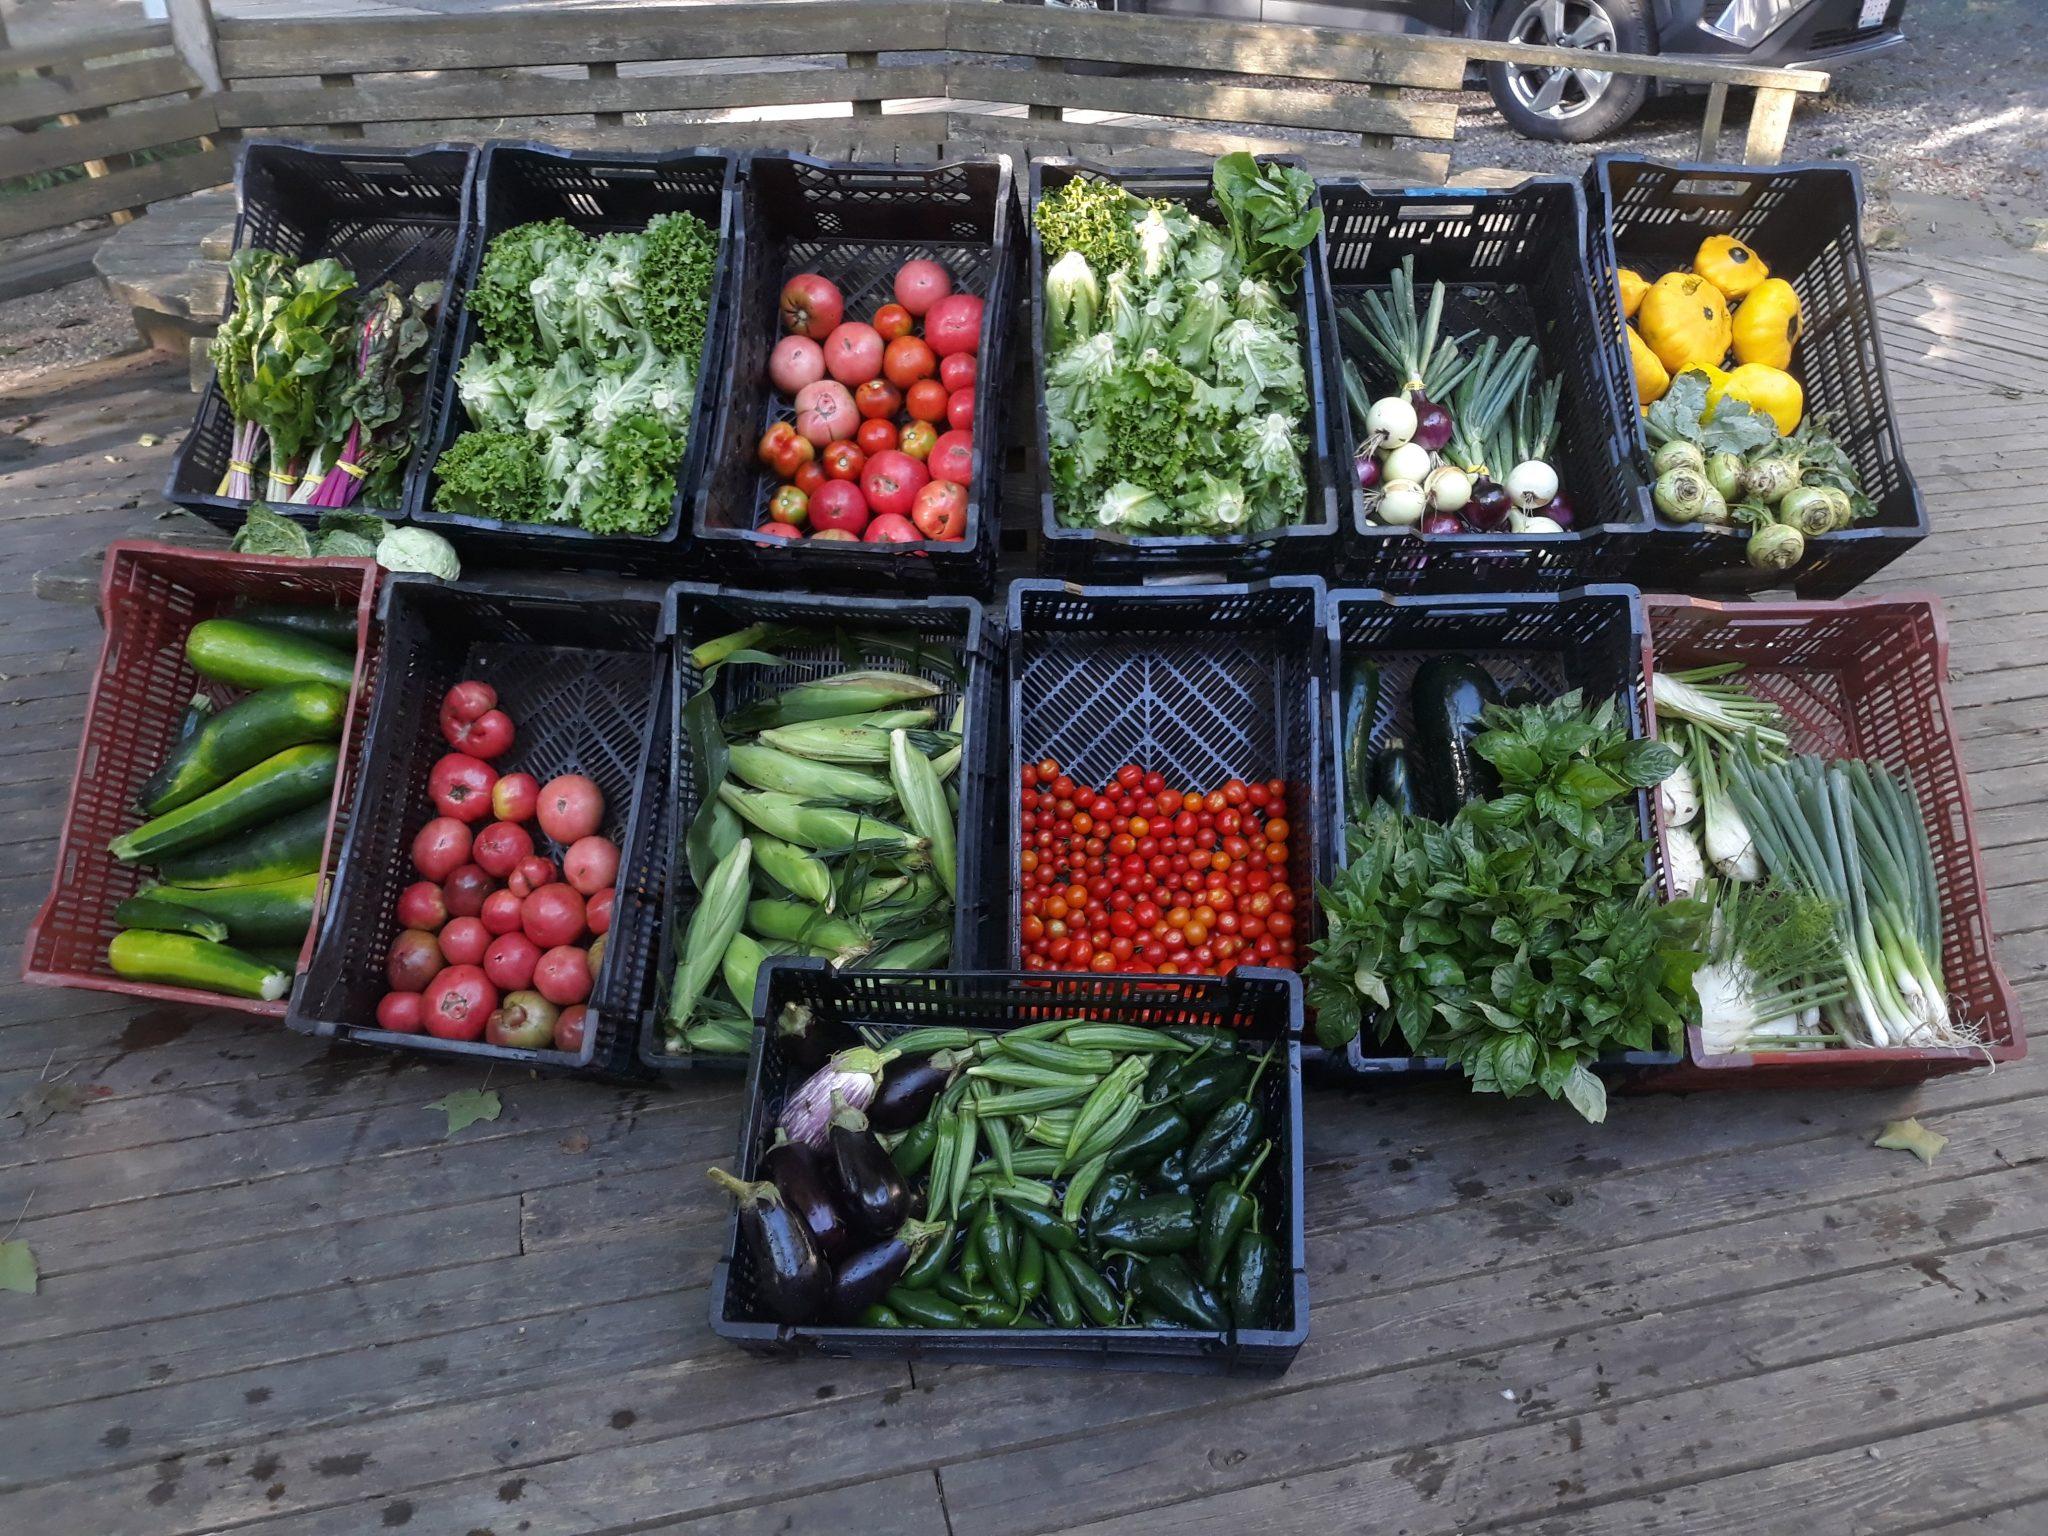 Lots of Garden Vegtables in Bins